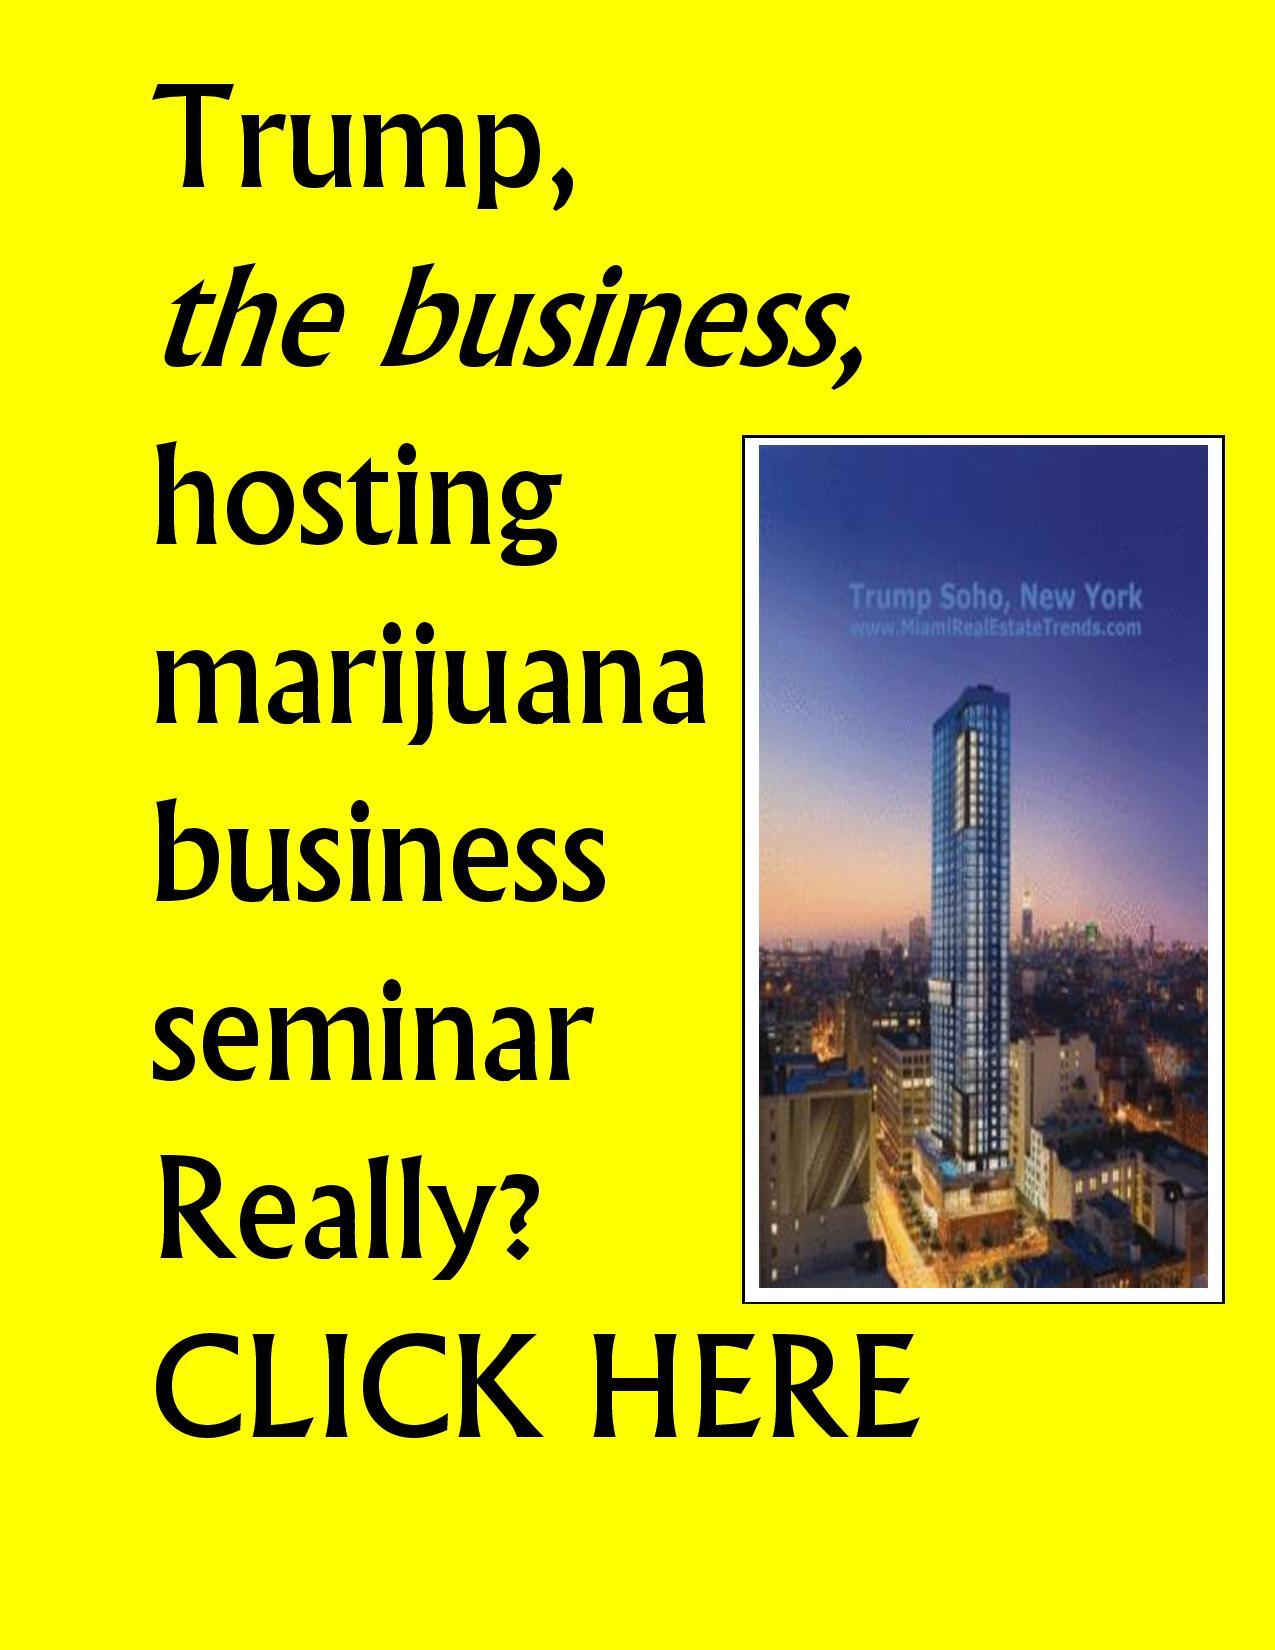 trump_mj_biz_seminar-page-001.jpg